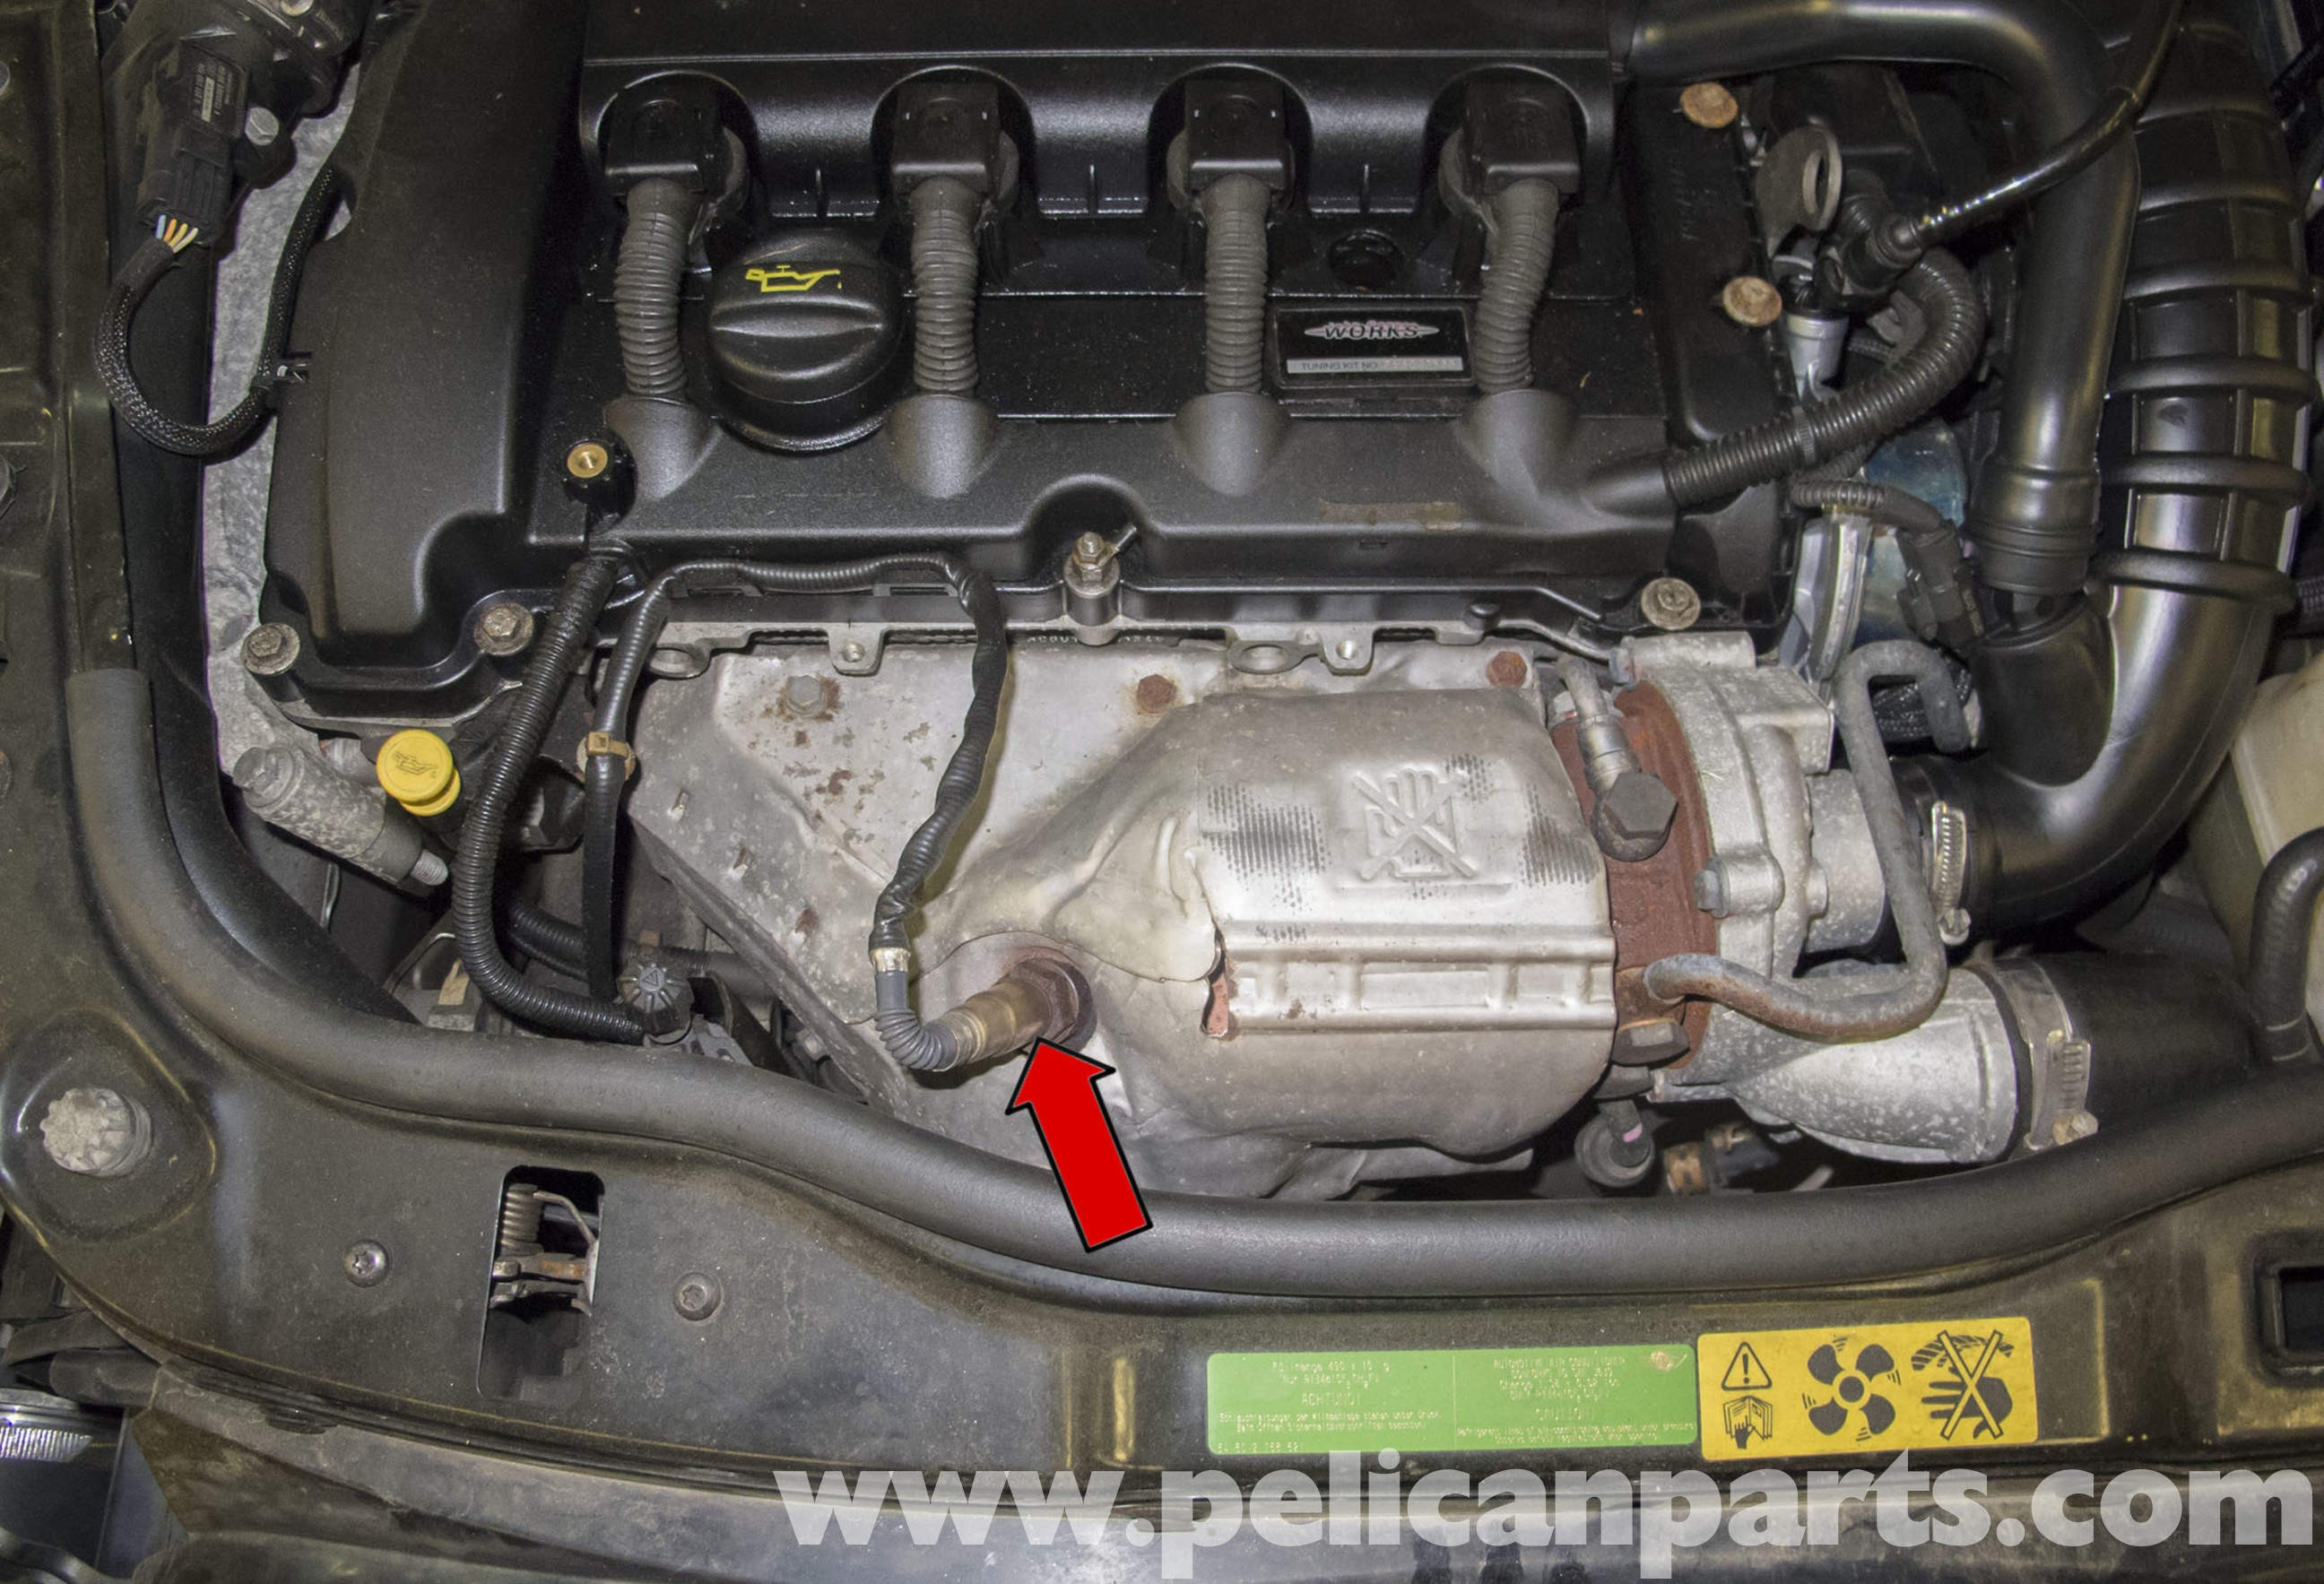 2006 Mini Cooper S Engine Compartment Diagram Mini Cooper R56 Turbocharged Engine Alternator Replacement 2007 Of 2006 Mini Cooper S Engine Compartment Diagram